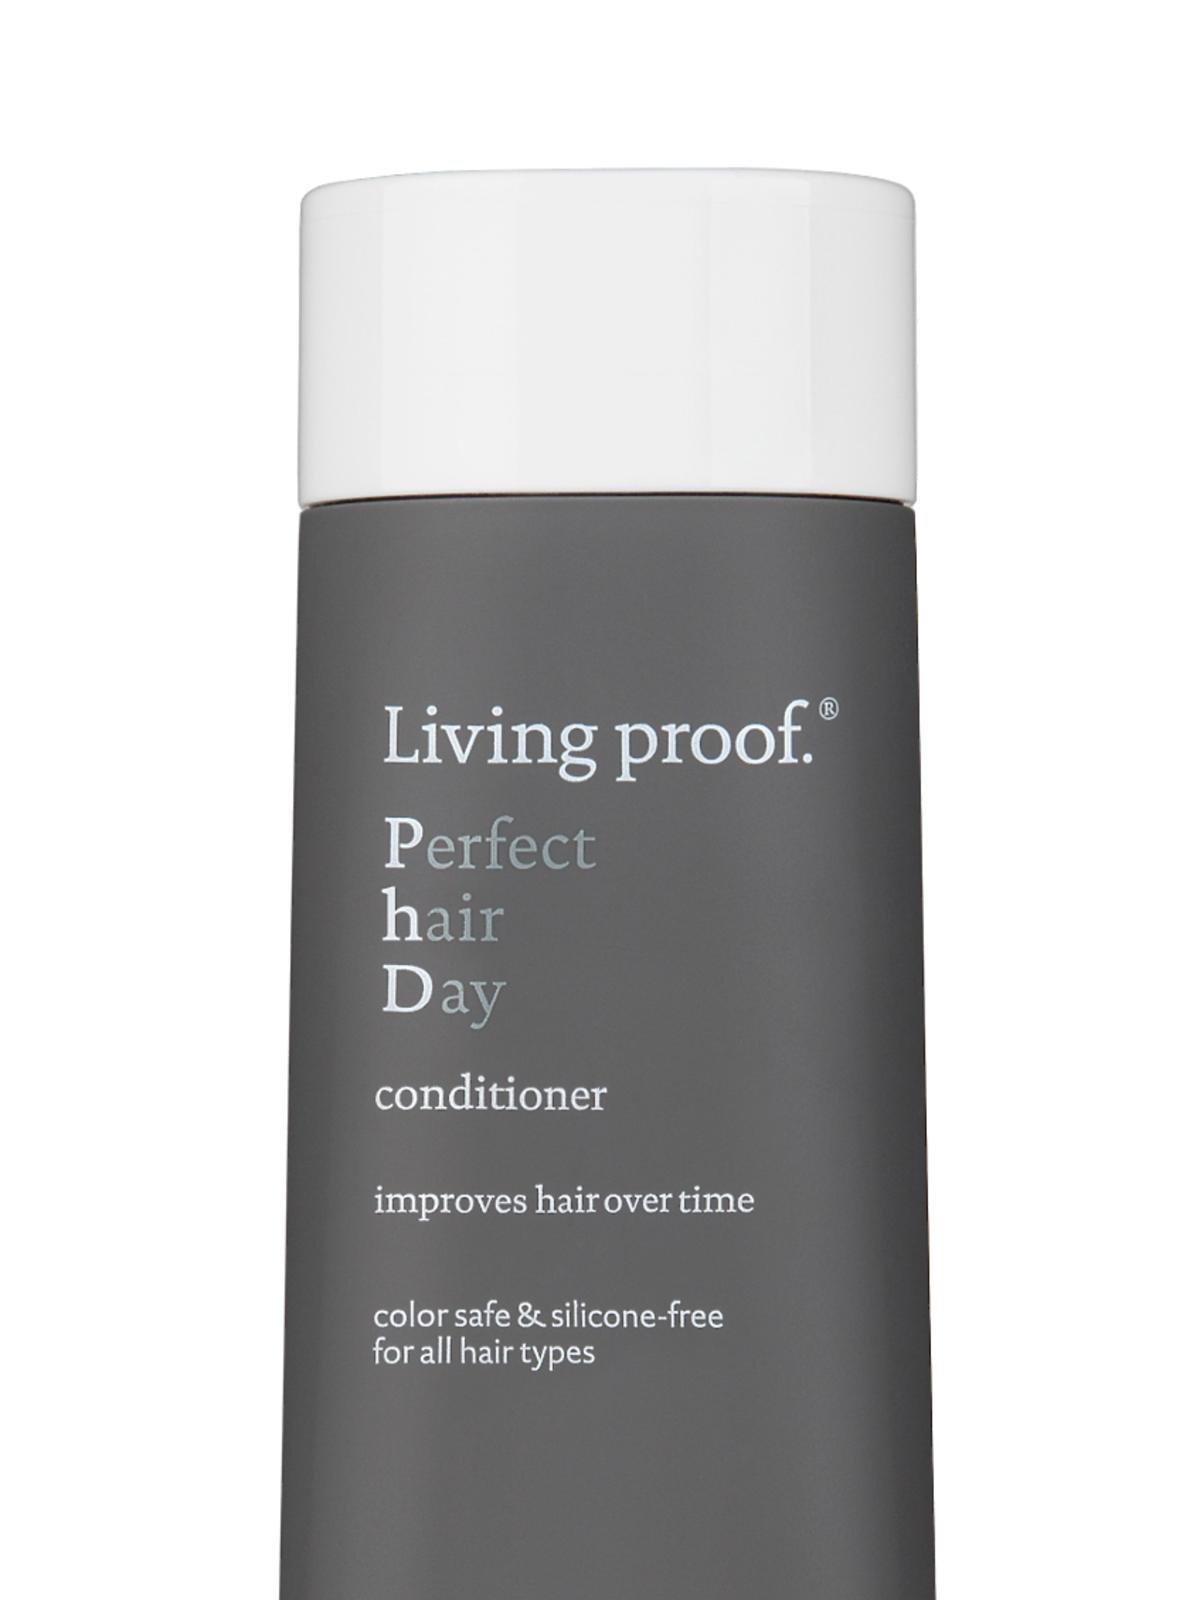 Odżywka Perferct Hair Dair Living Proof, 110zł